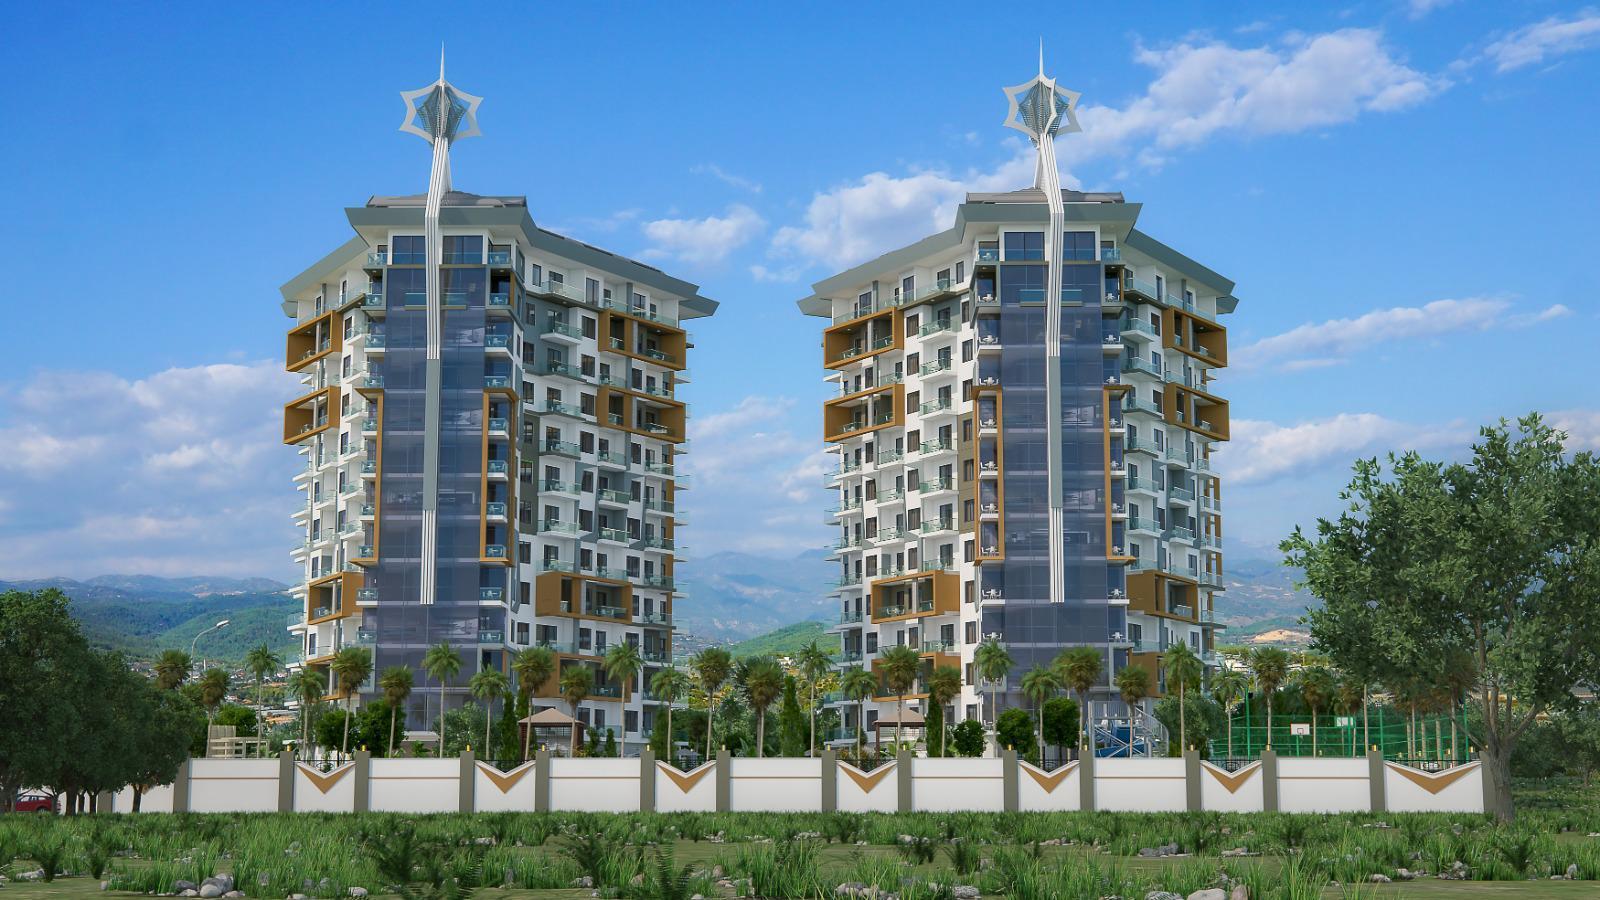 Квартиры и пентхаусы в комплексе с богатой инфраструктурой район Махмутлар